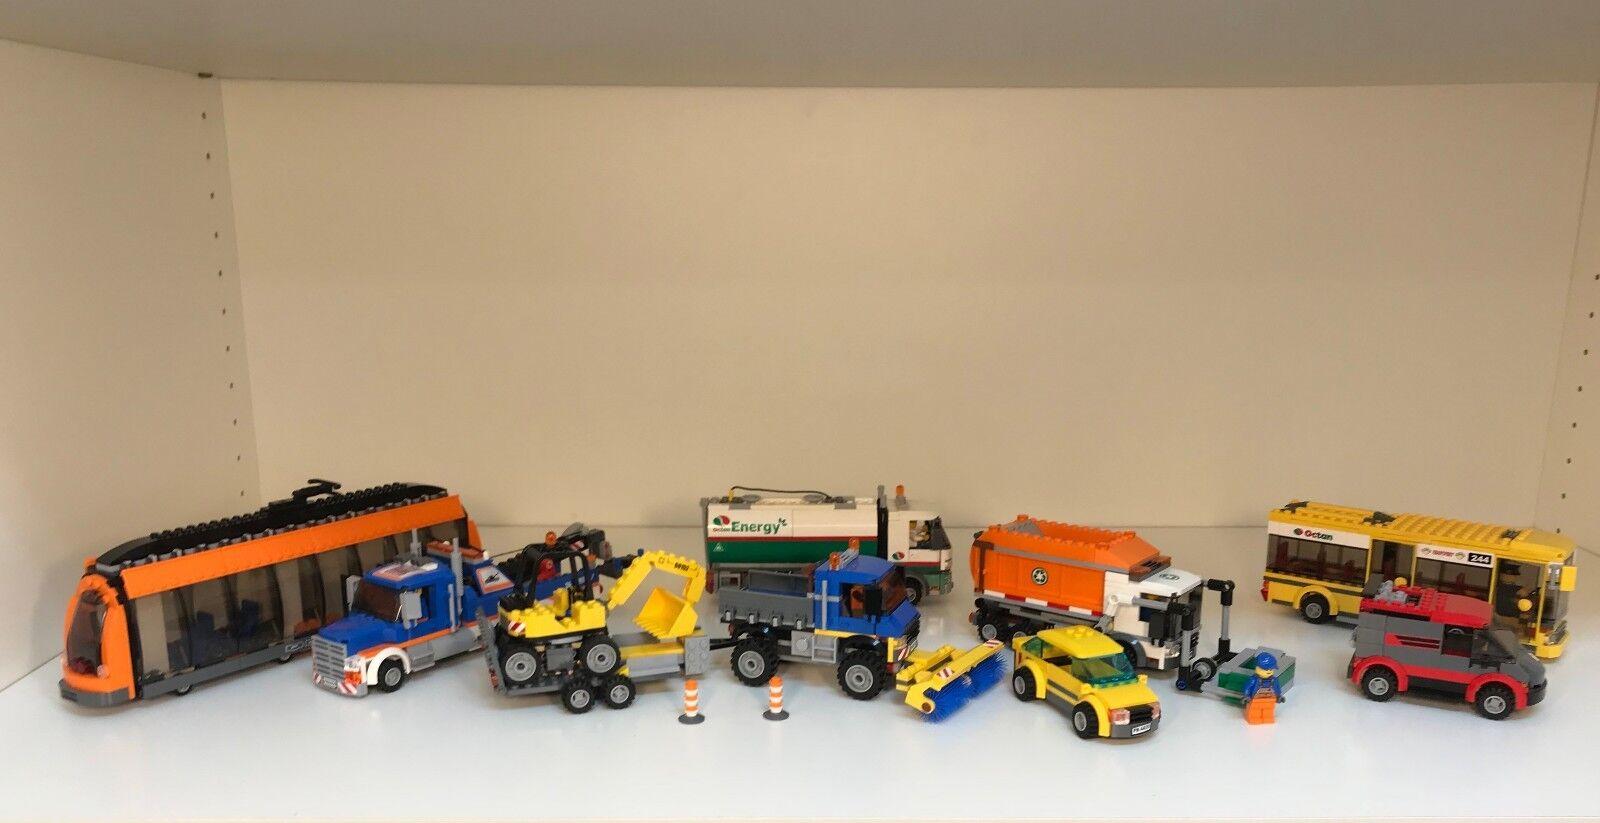 Lego City Car Lot 60118 60056 60152 60016 60017 4435 60008 60097 7641 (11 cars )